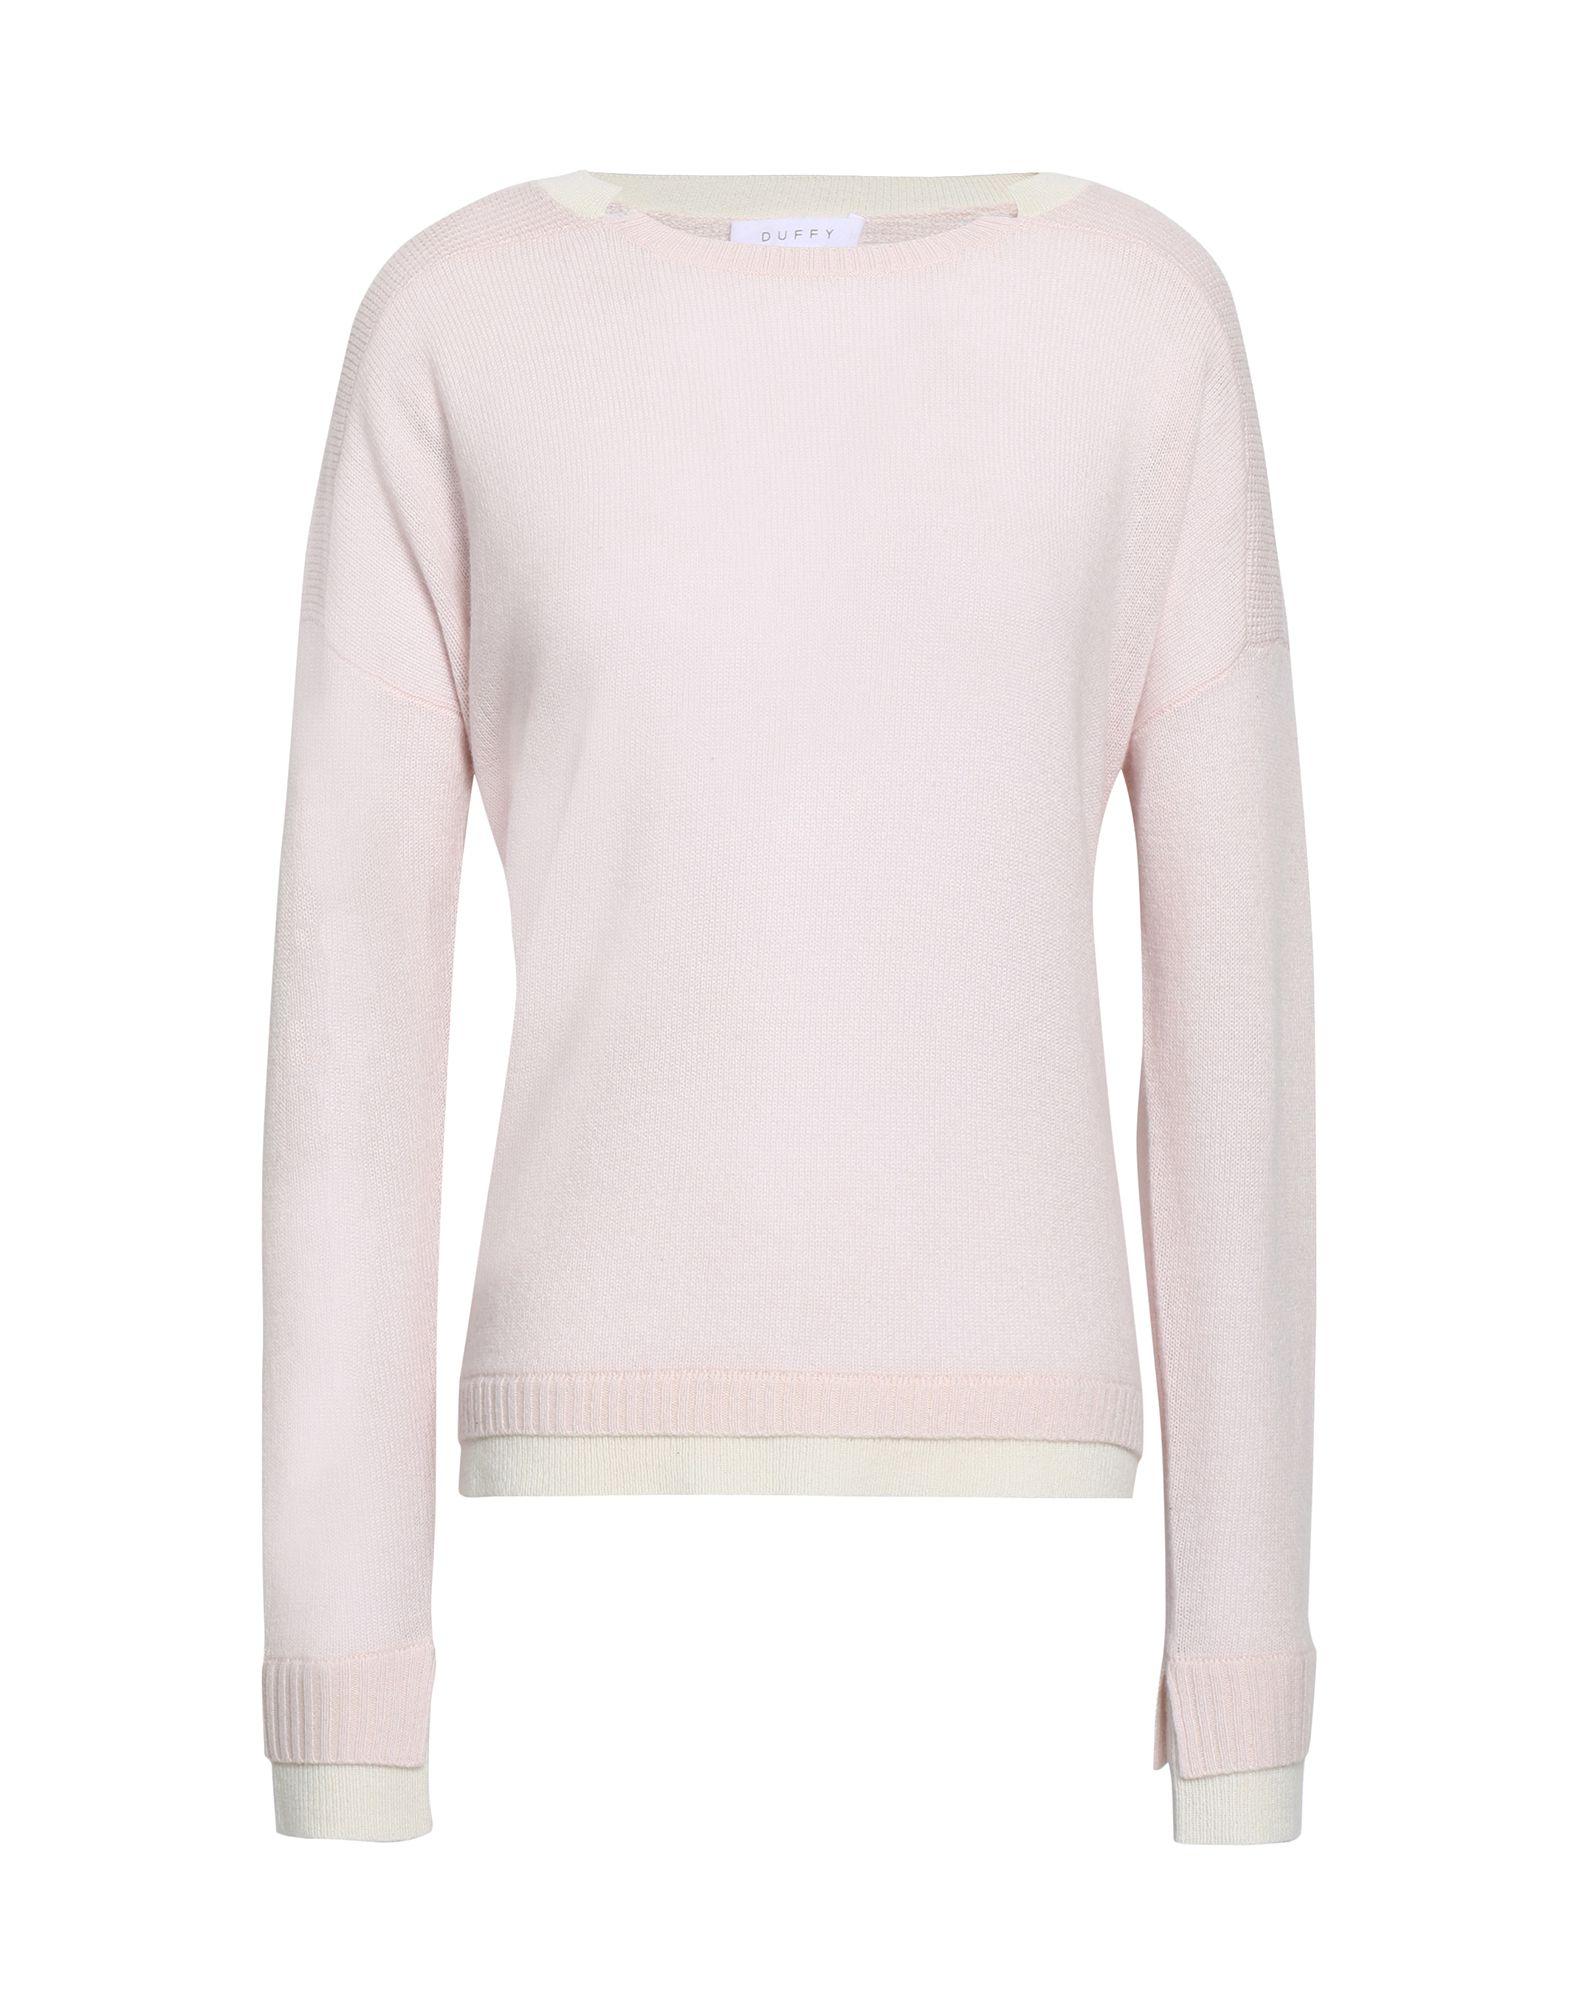 DUFFY Свитер duffy свитер